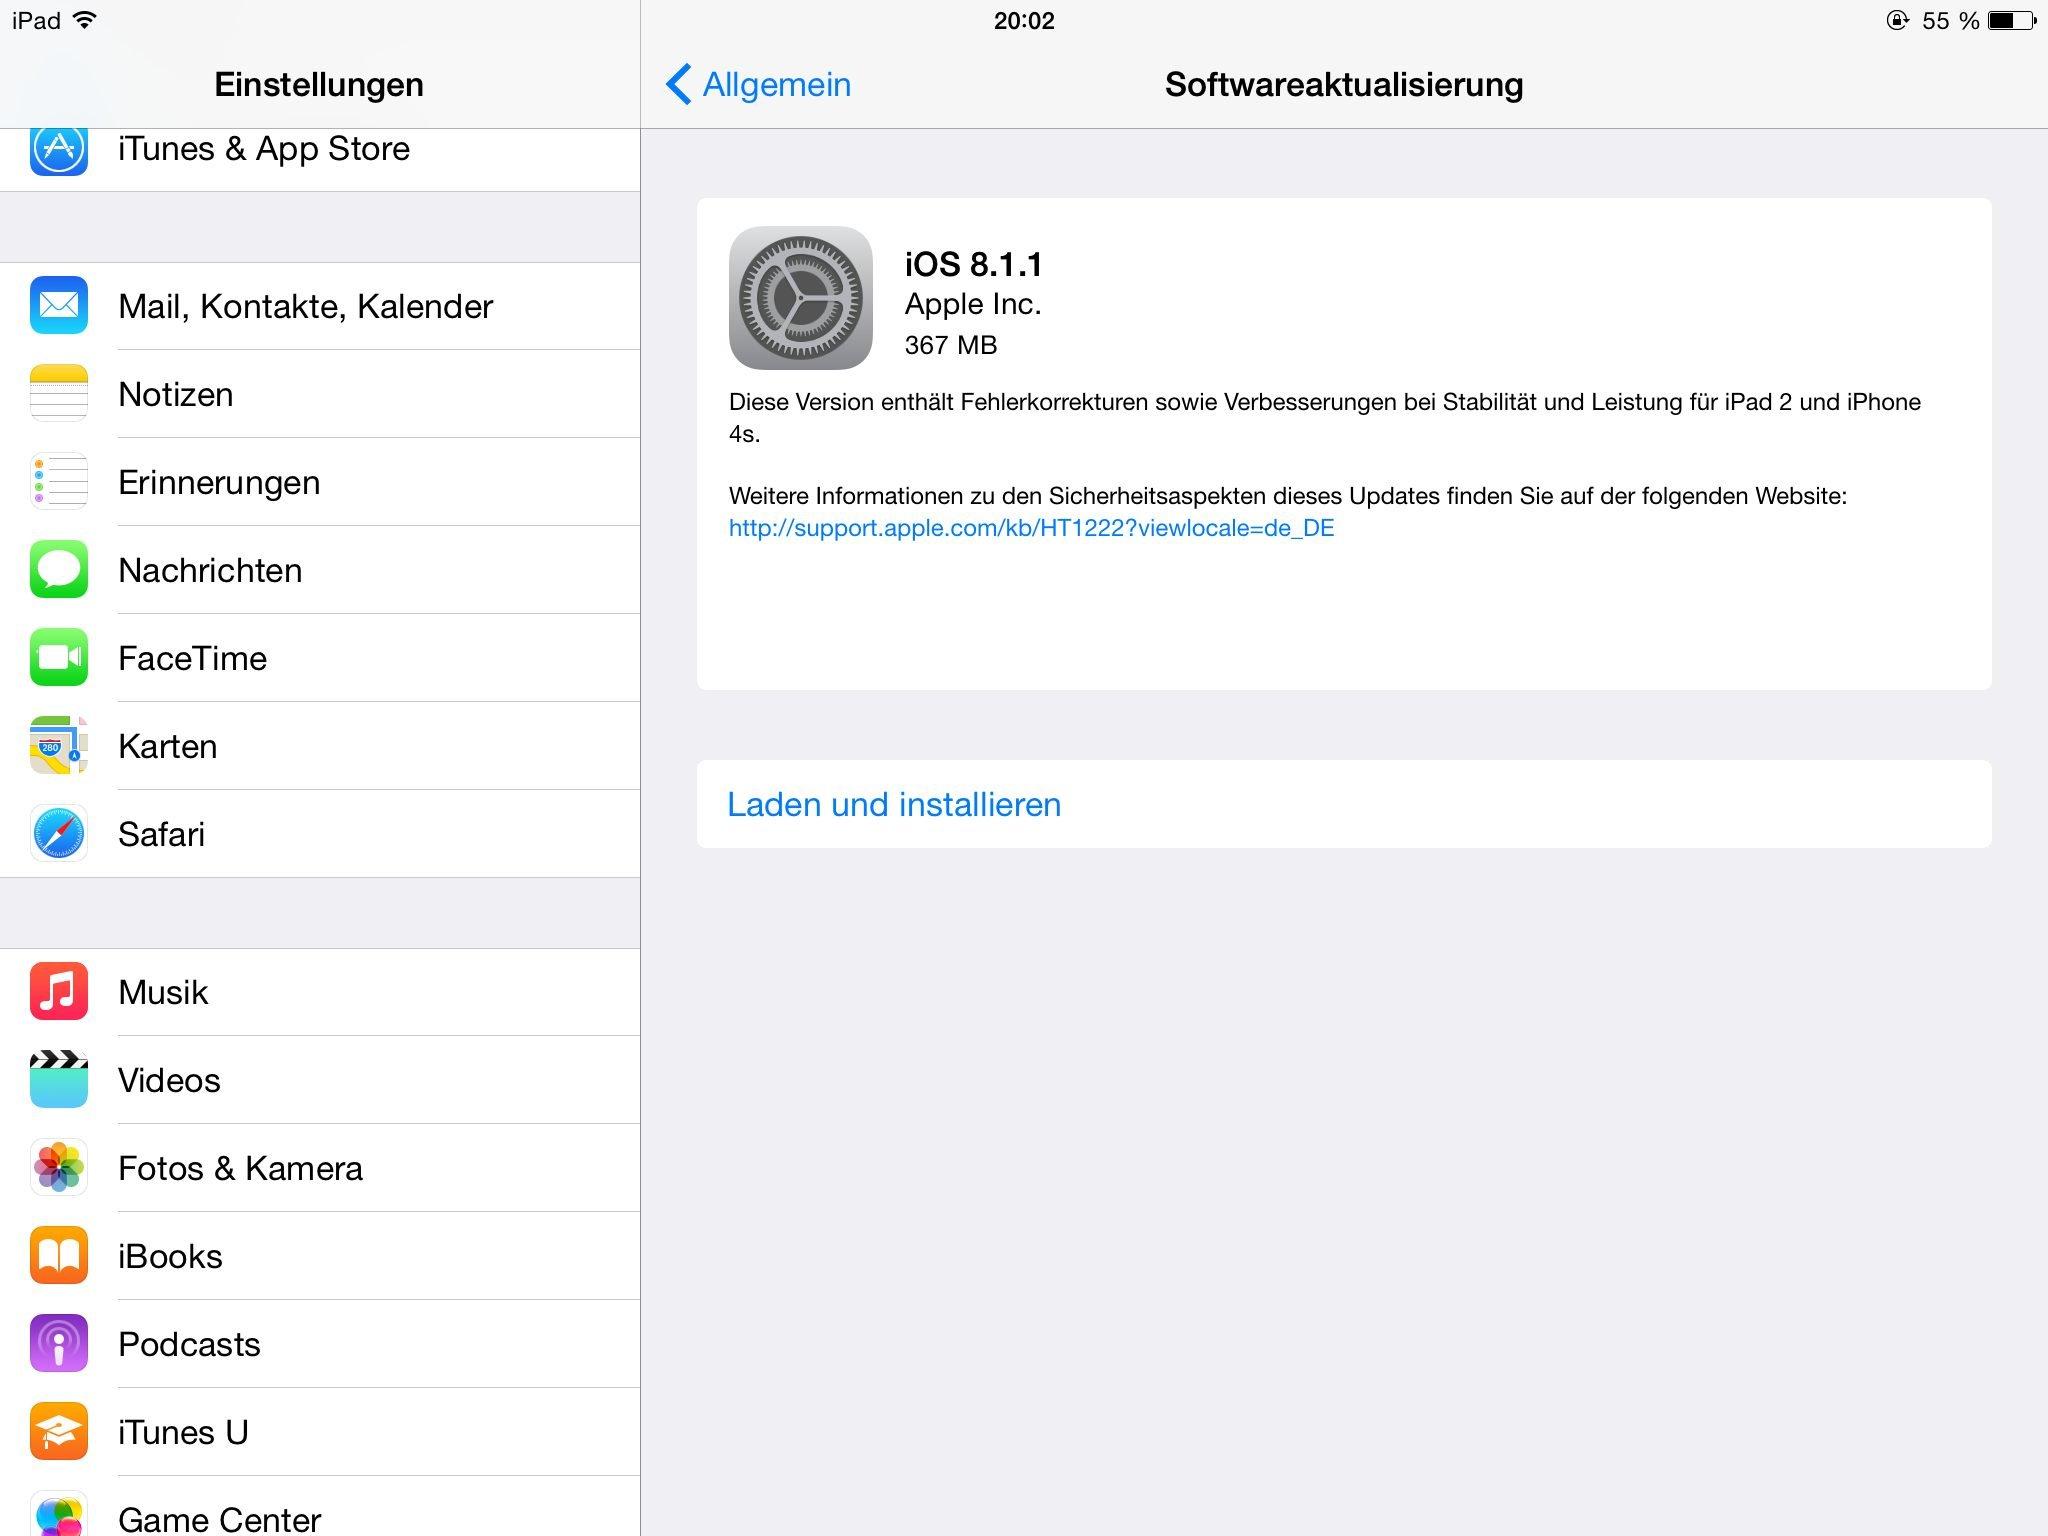 iOS 8.1.1 - Downloadhinweis